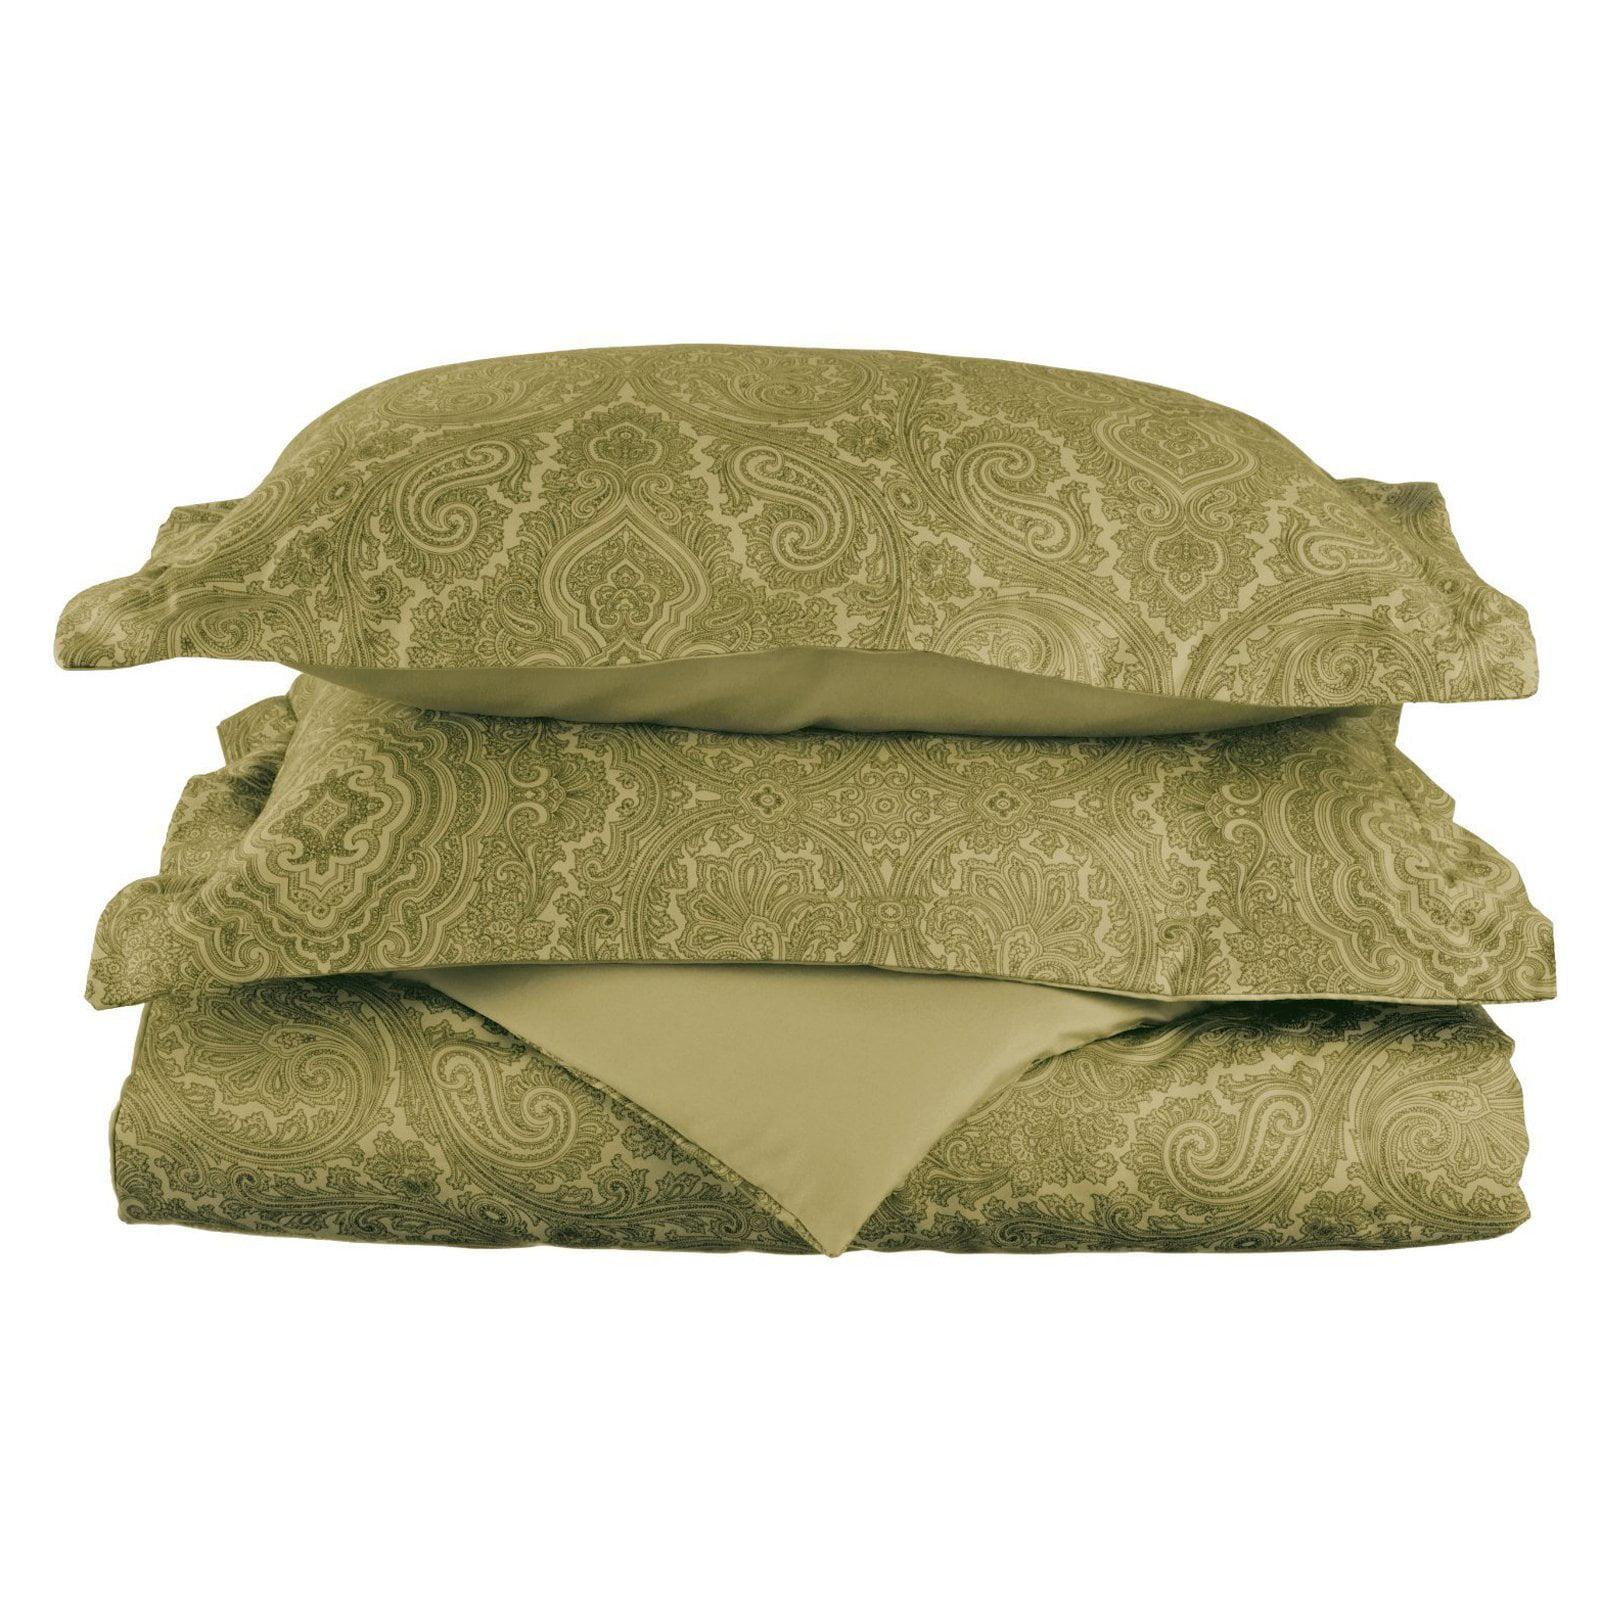 Superior 600 Thread Count Wrinkle-Resistant Cotton Blend Italian Paisley Design Duvet Cover Set with Sham